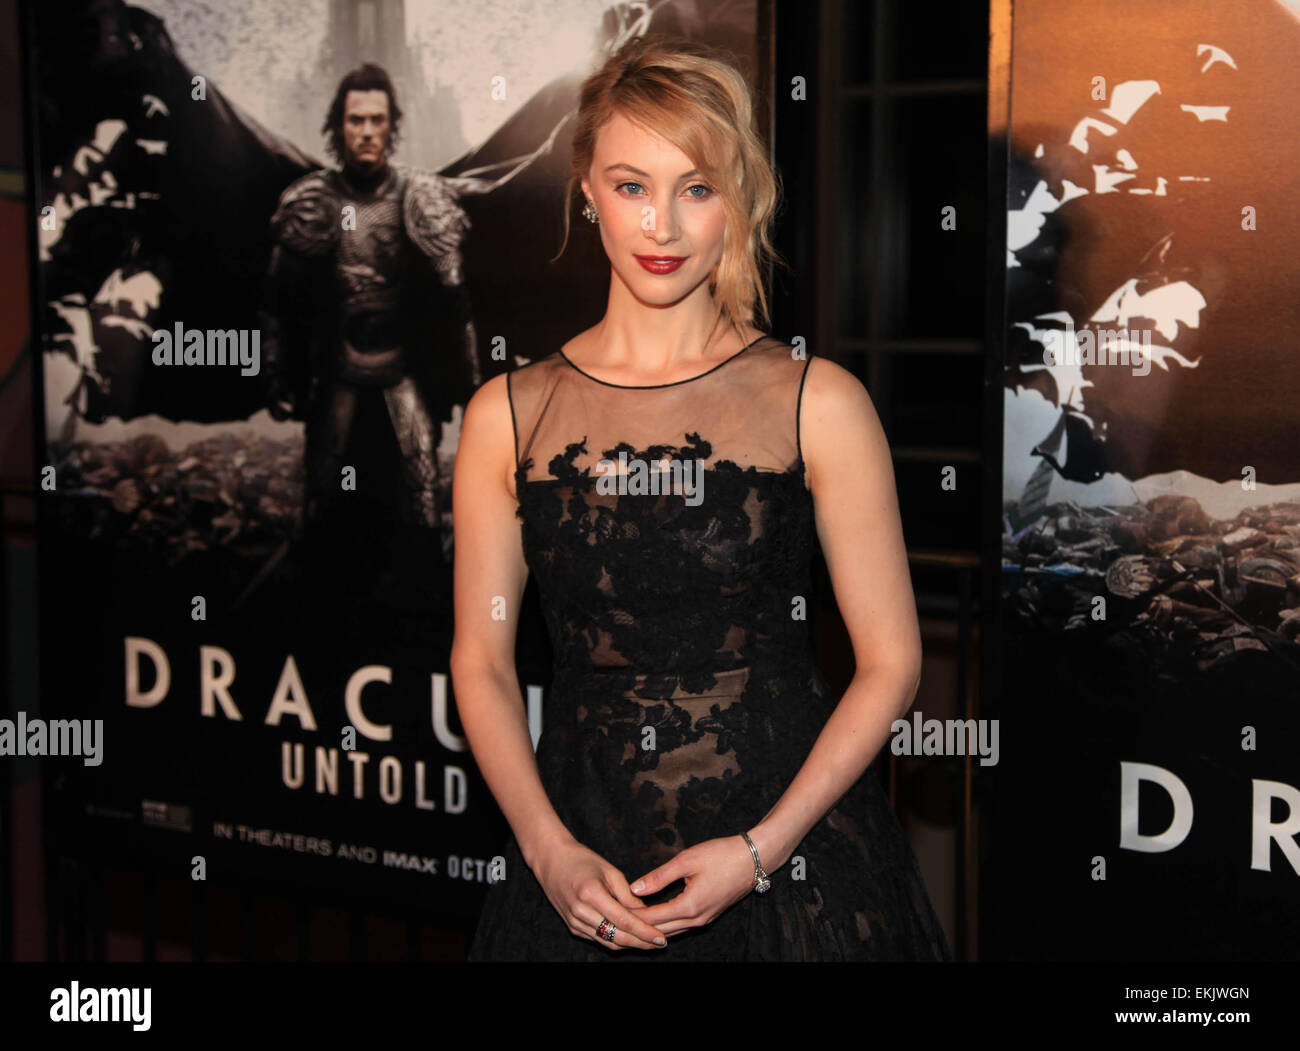 New York Premiere Of Dracula Untold At Amc Loews 34th Street 14